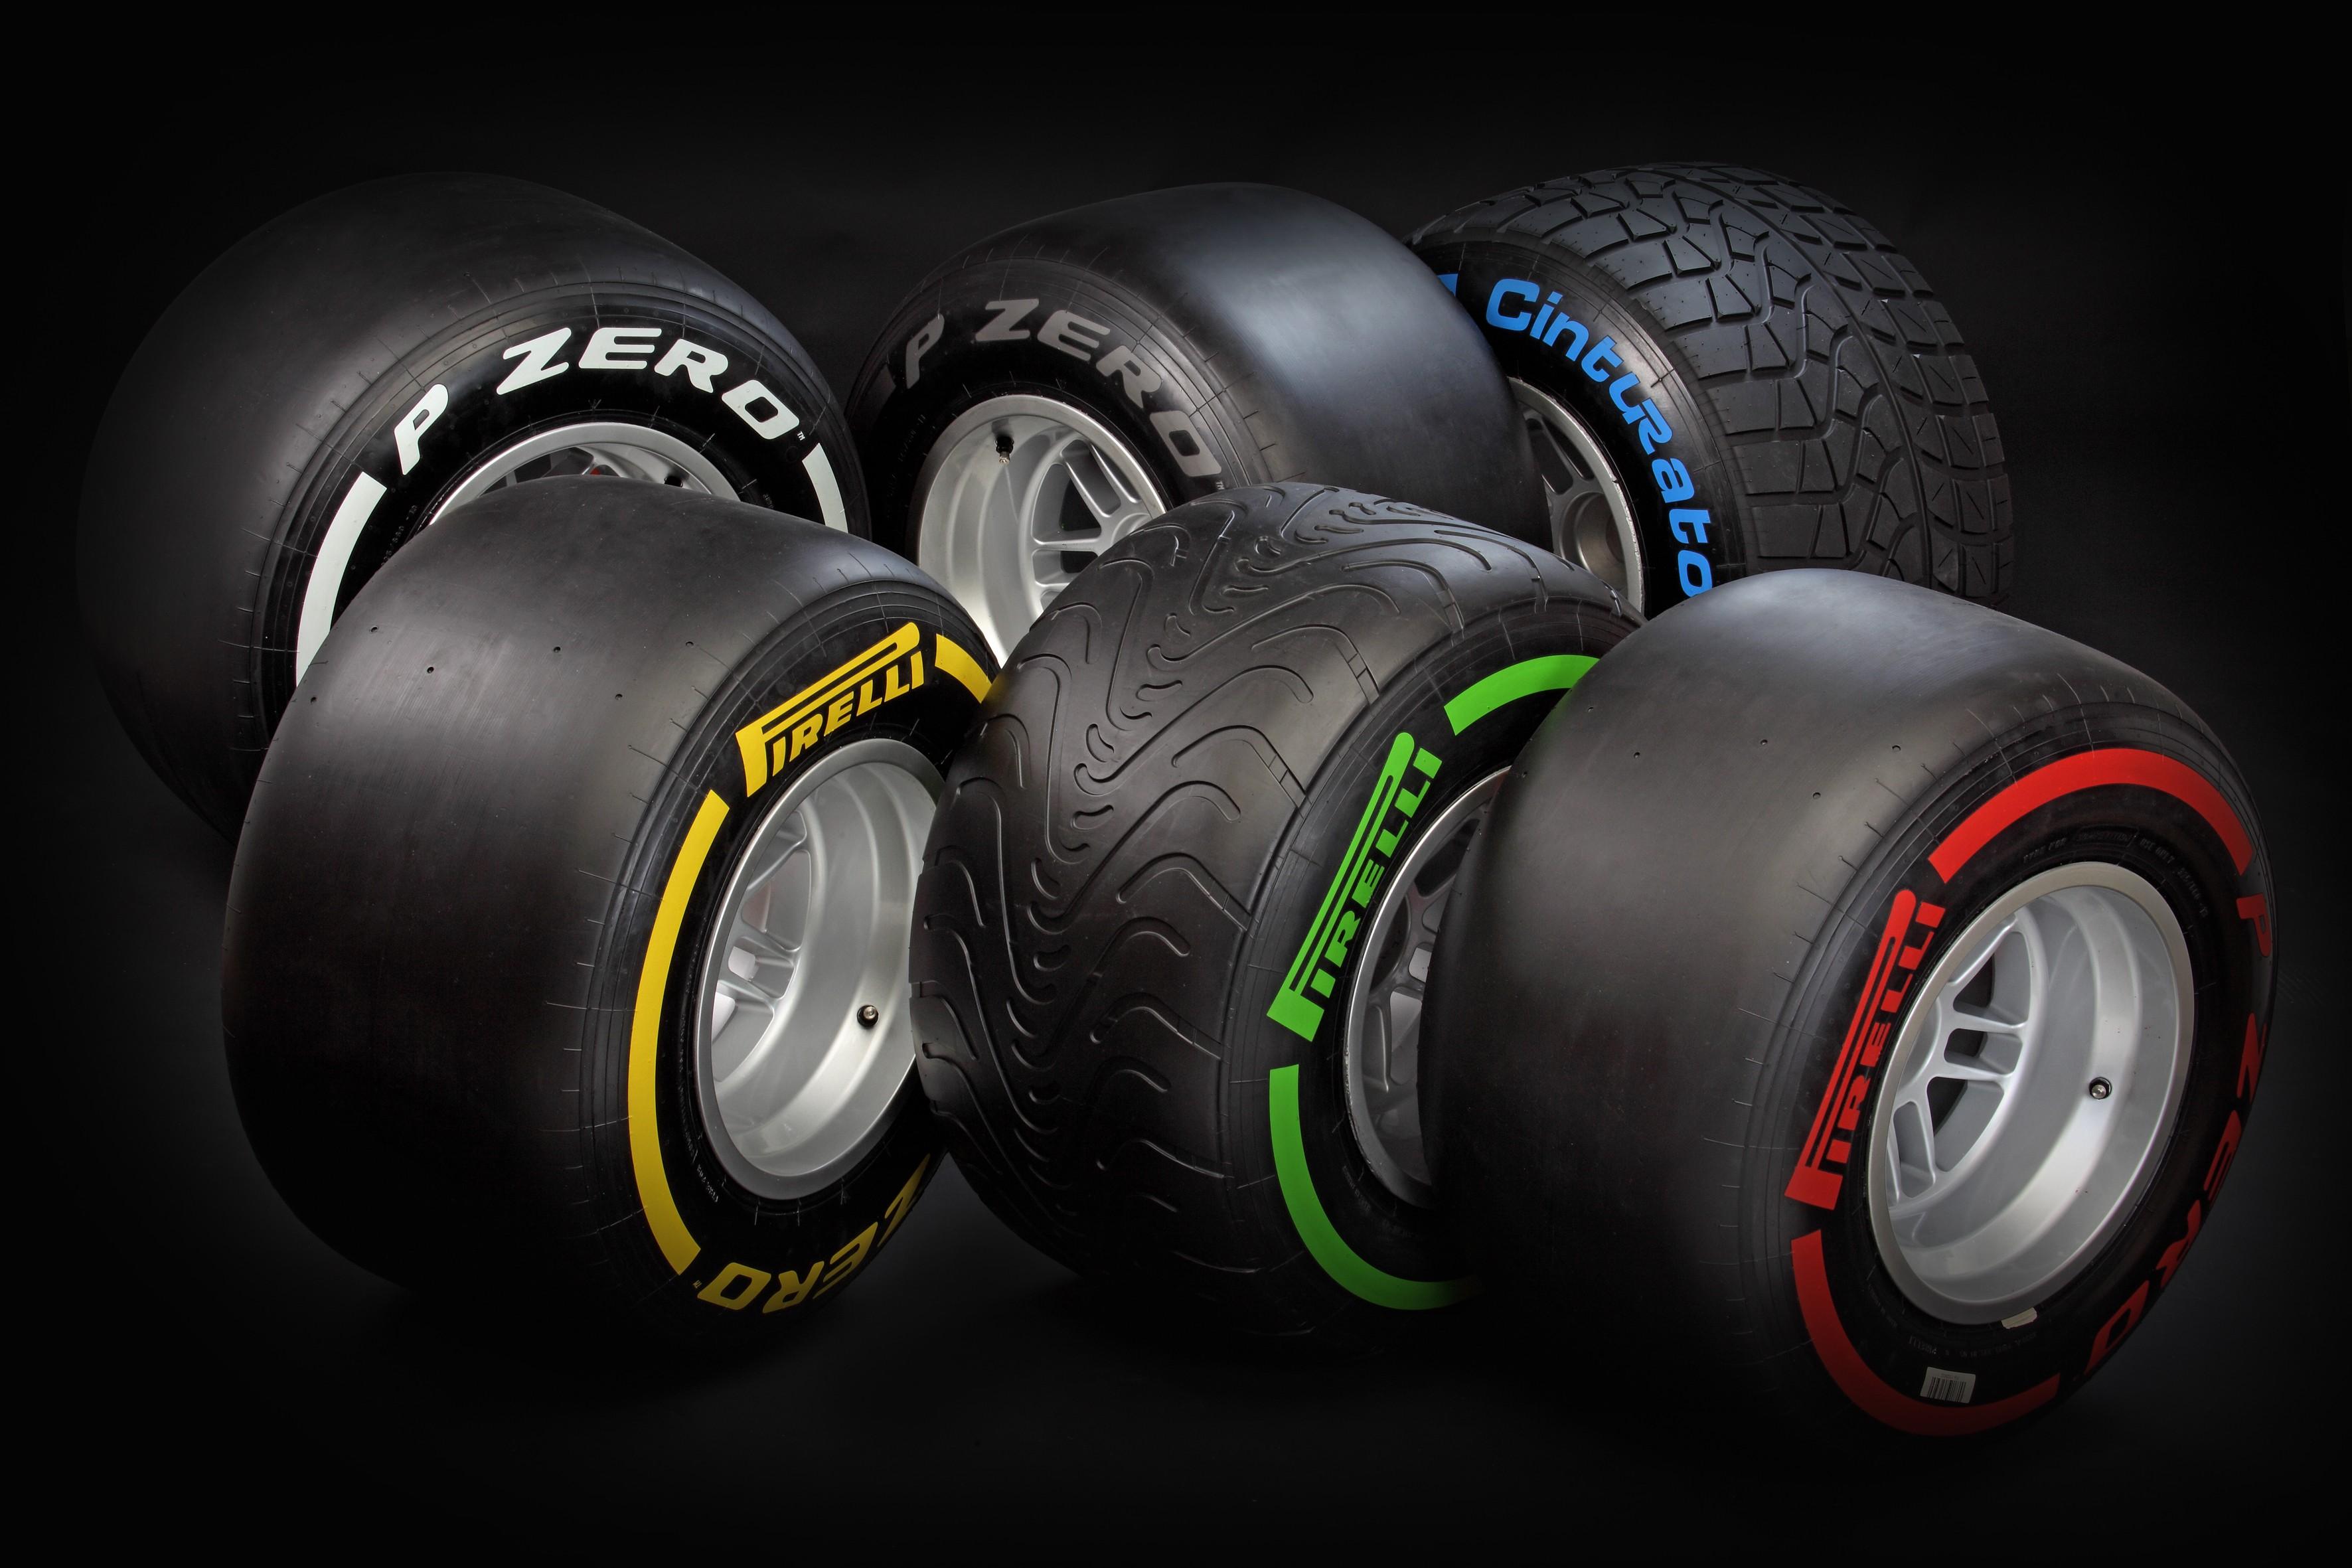 blue rubber sports Formula One pirelli soft 2012 Tyres 3543x2362